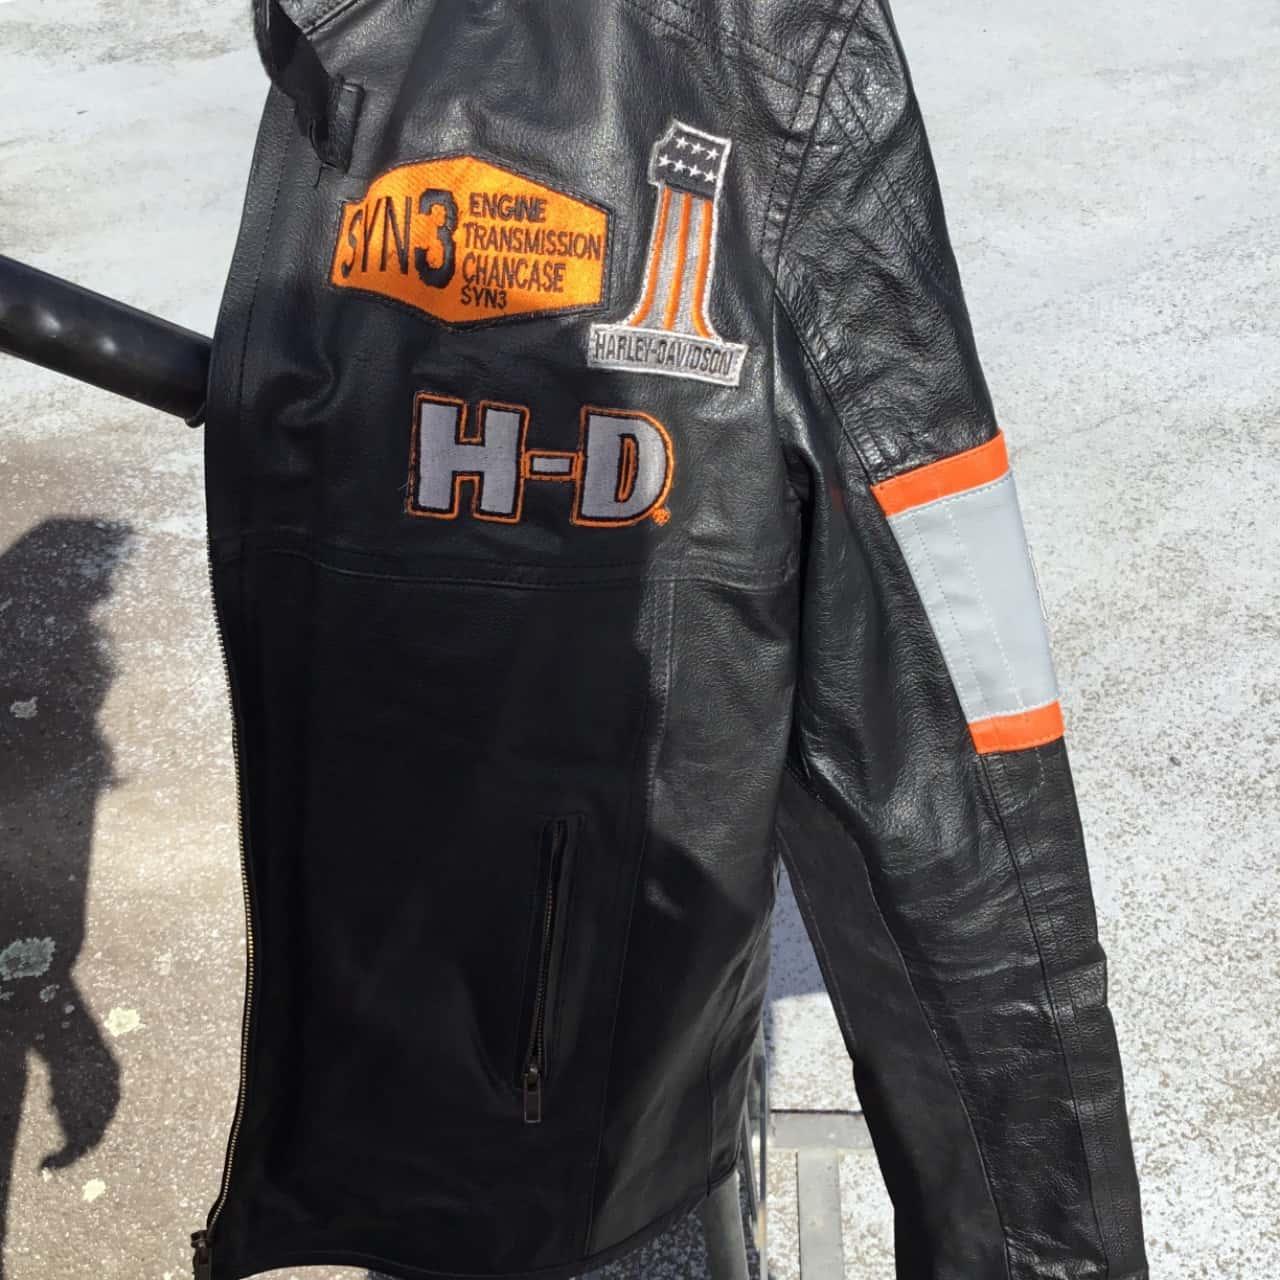 Harley Davidson Motor Cycles Black /Grey/Orange Jacket